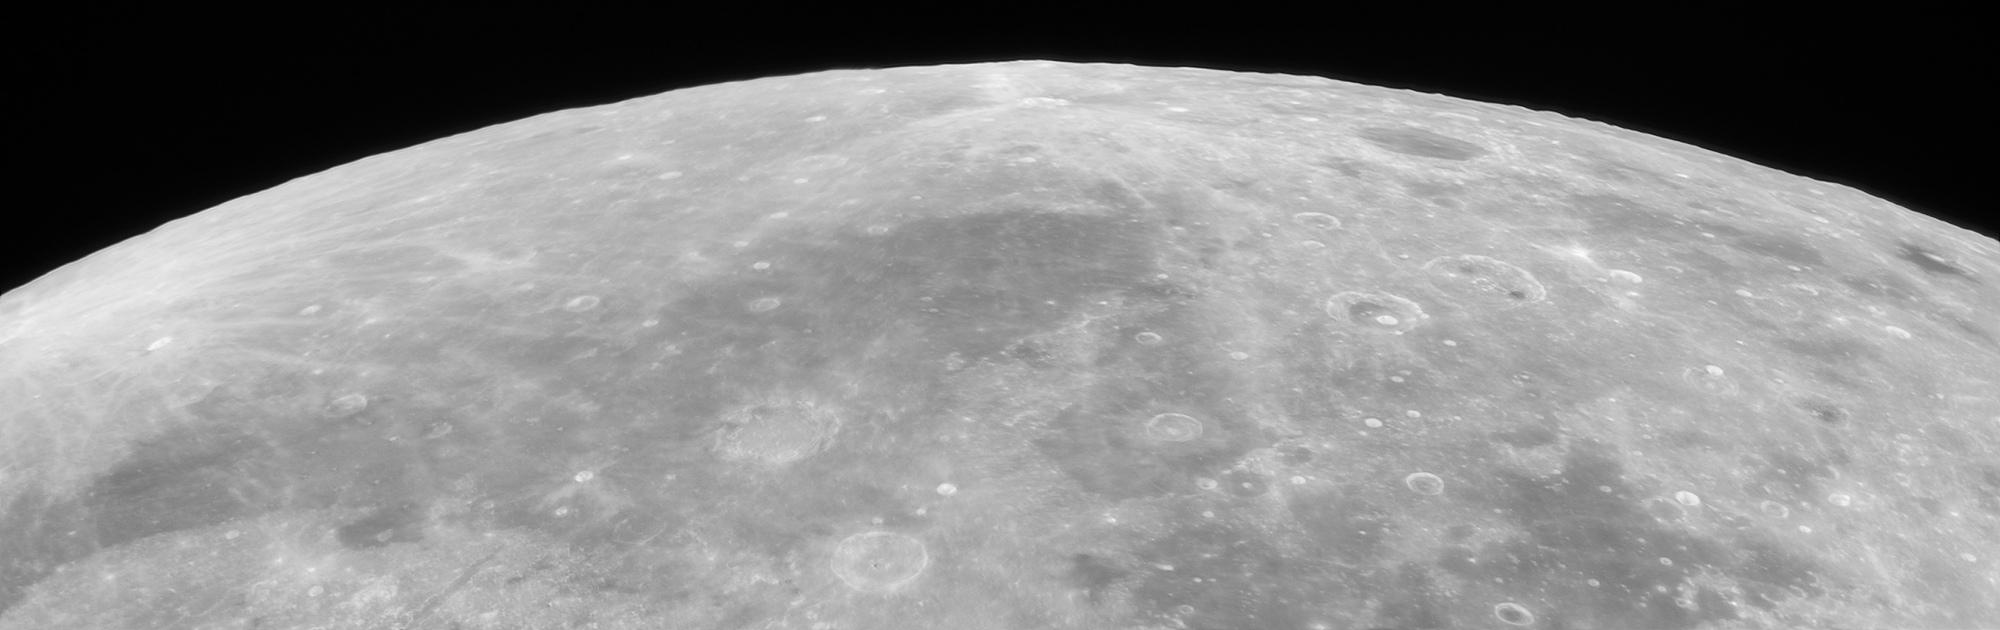 2021-02-26-2126_3-Moon_AS_P25_lapl6_ap2494_stitch.thumb.jpg.b1e8a88742260b20ecf89ce92ad2d883.jpg